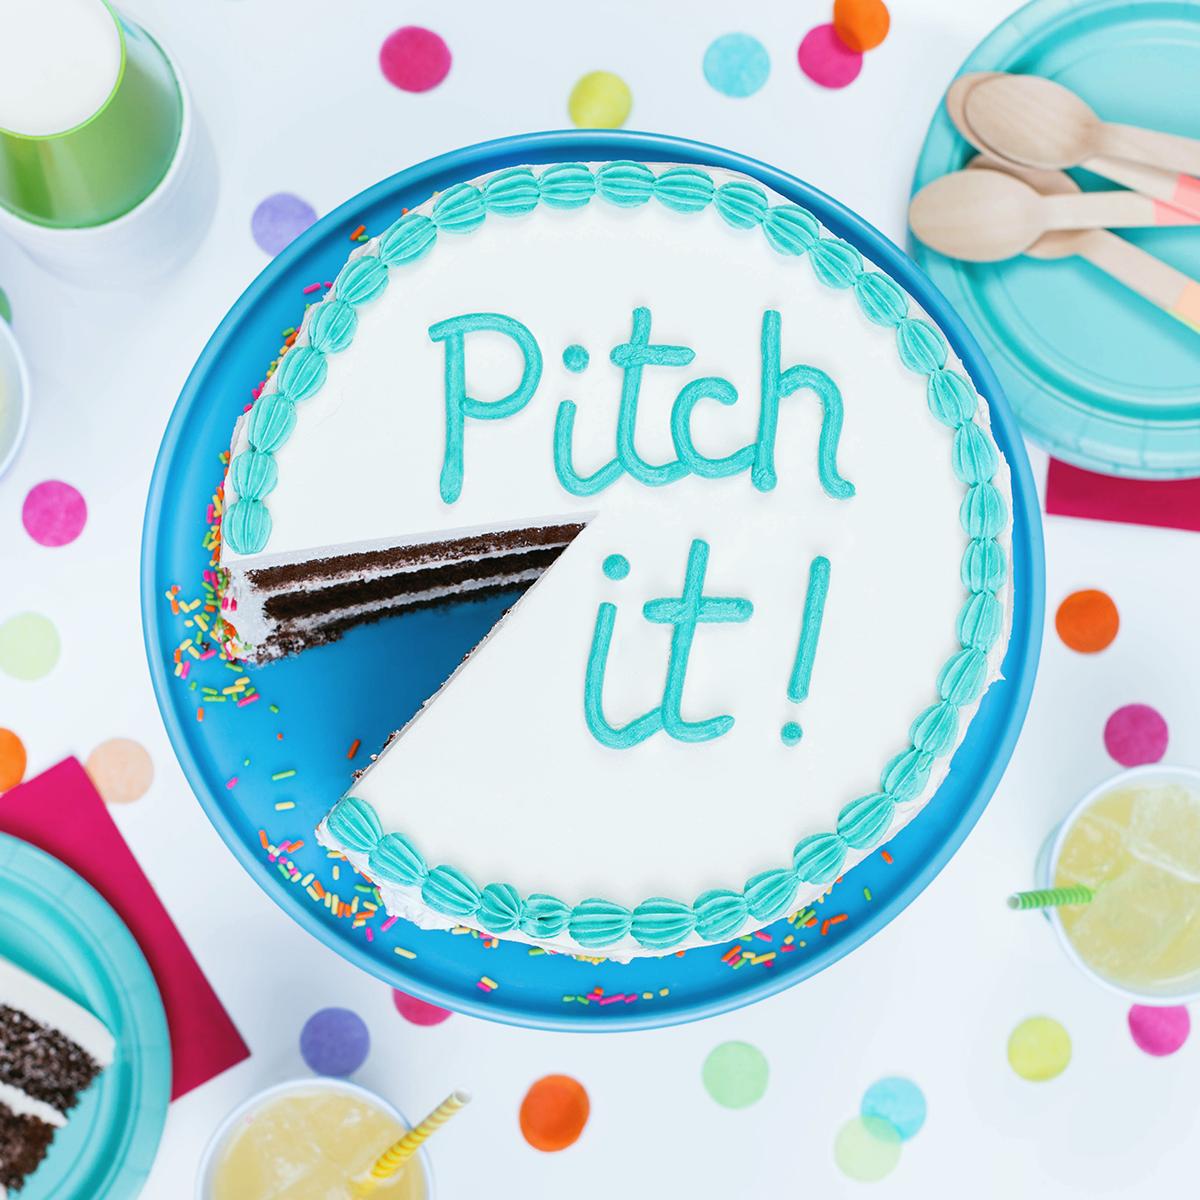 lays-pitchit-socialcampaign-birthdaycake.jpg